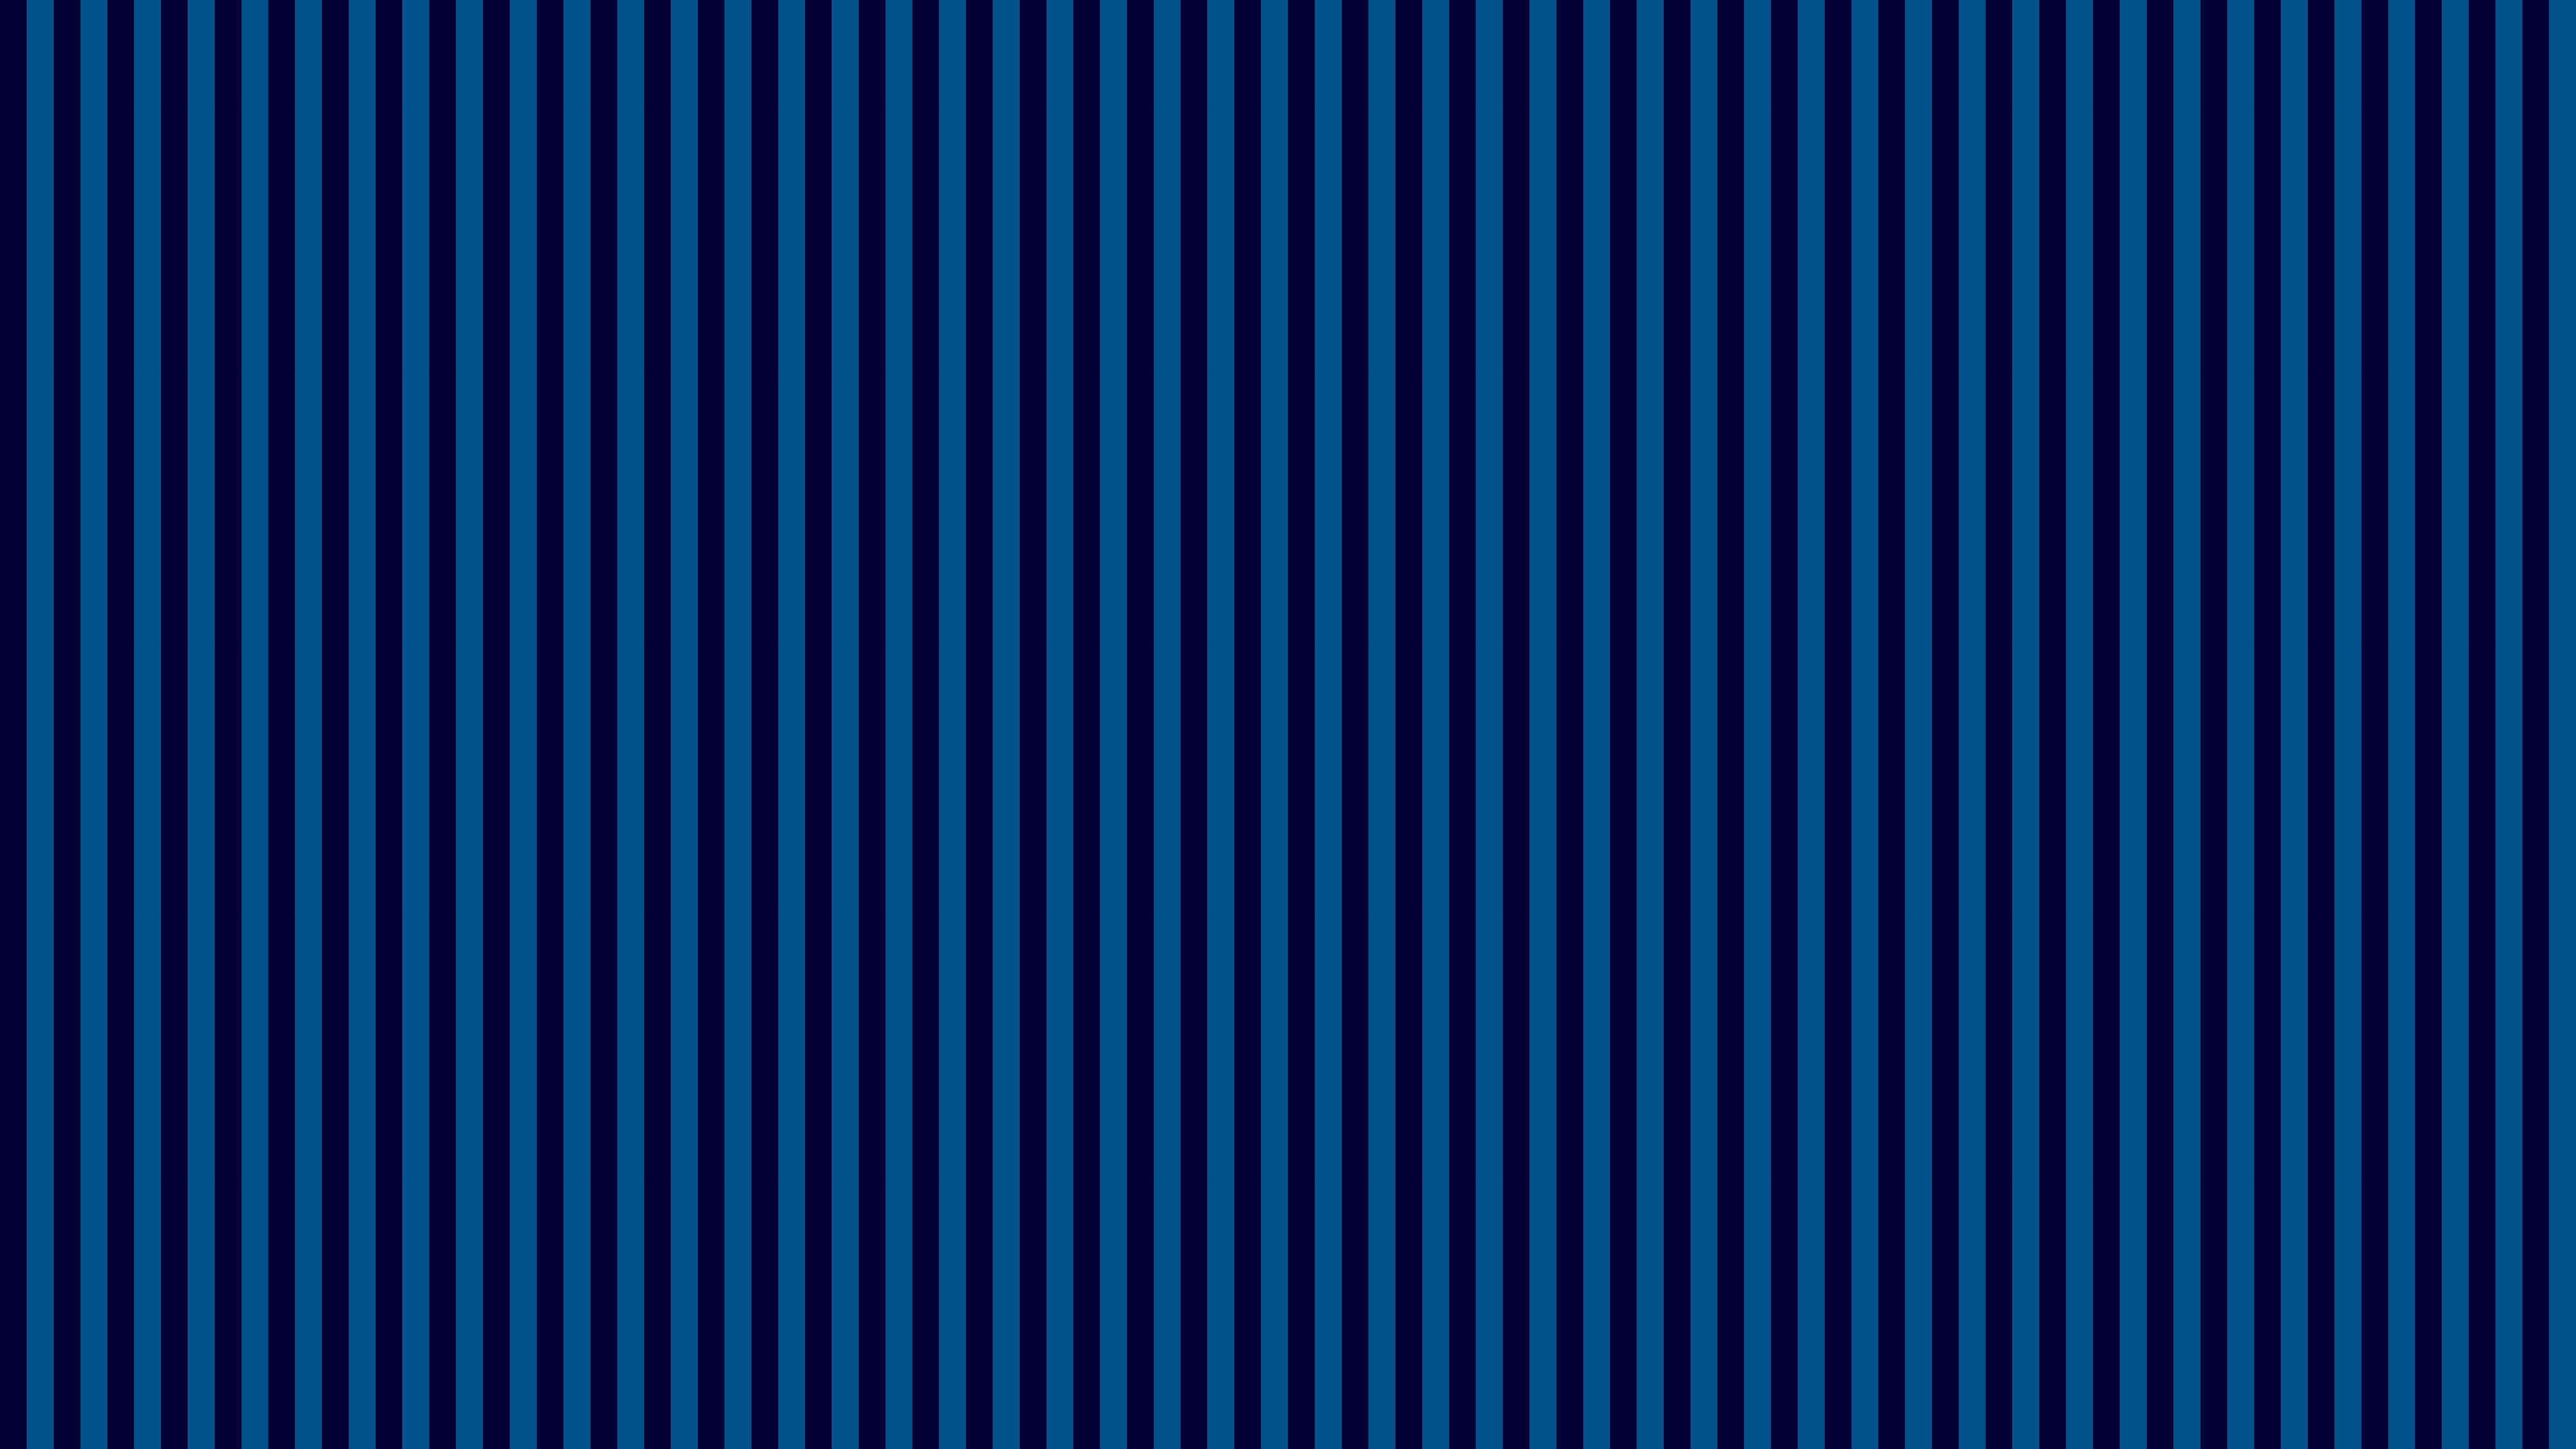 Free Navy Blue Seamless Vertical Stripes Background Pattern Illustration